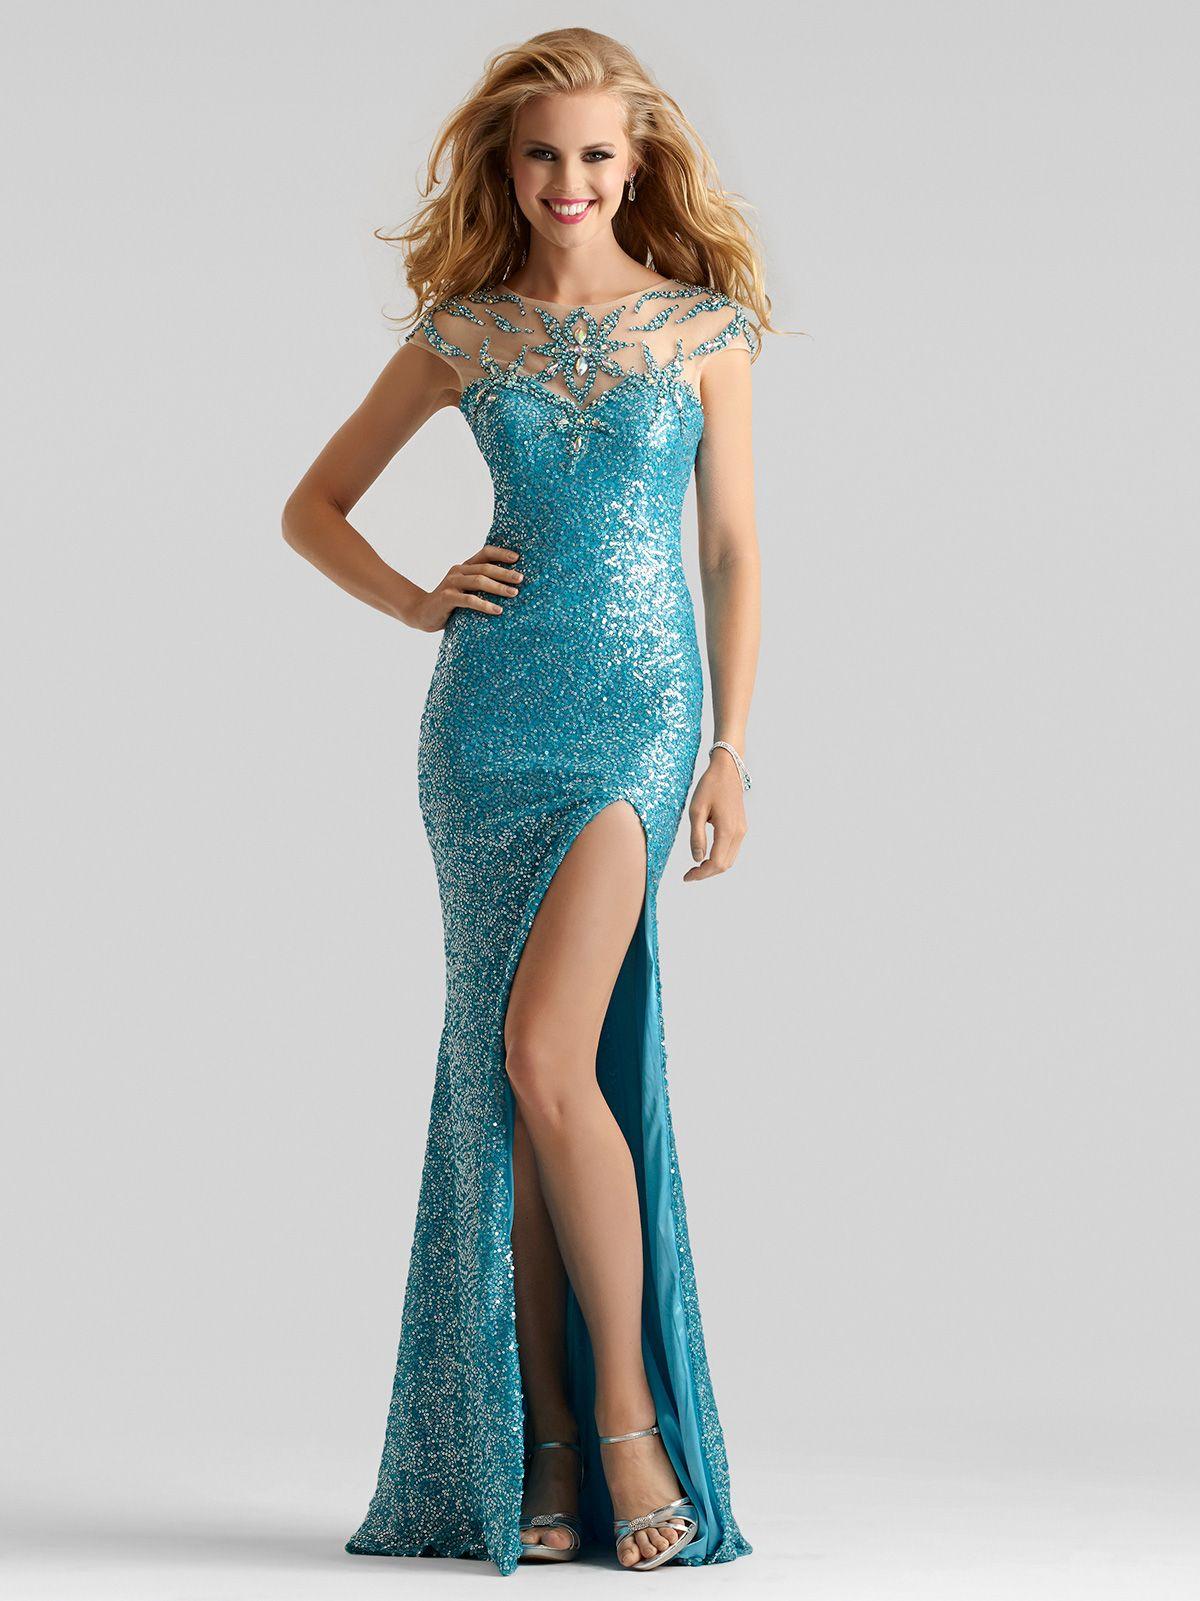 Modern Prom Dresses Sydney Pictures - All Wedding Dresses ...